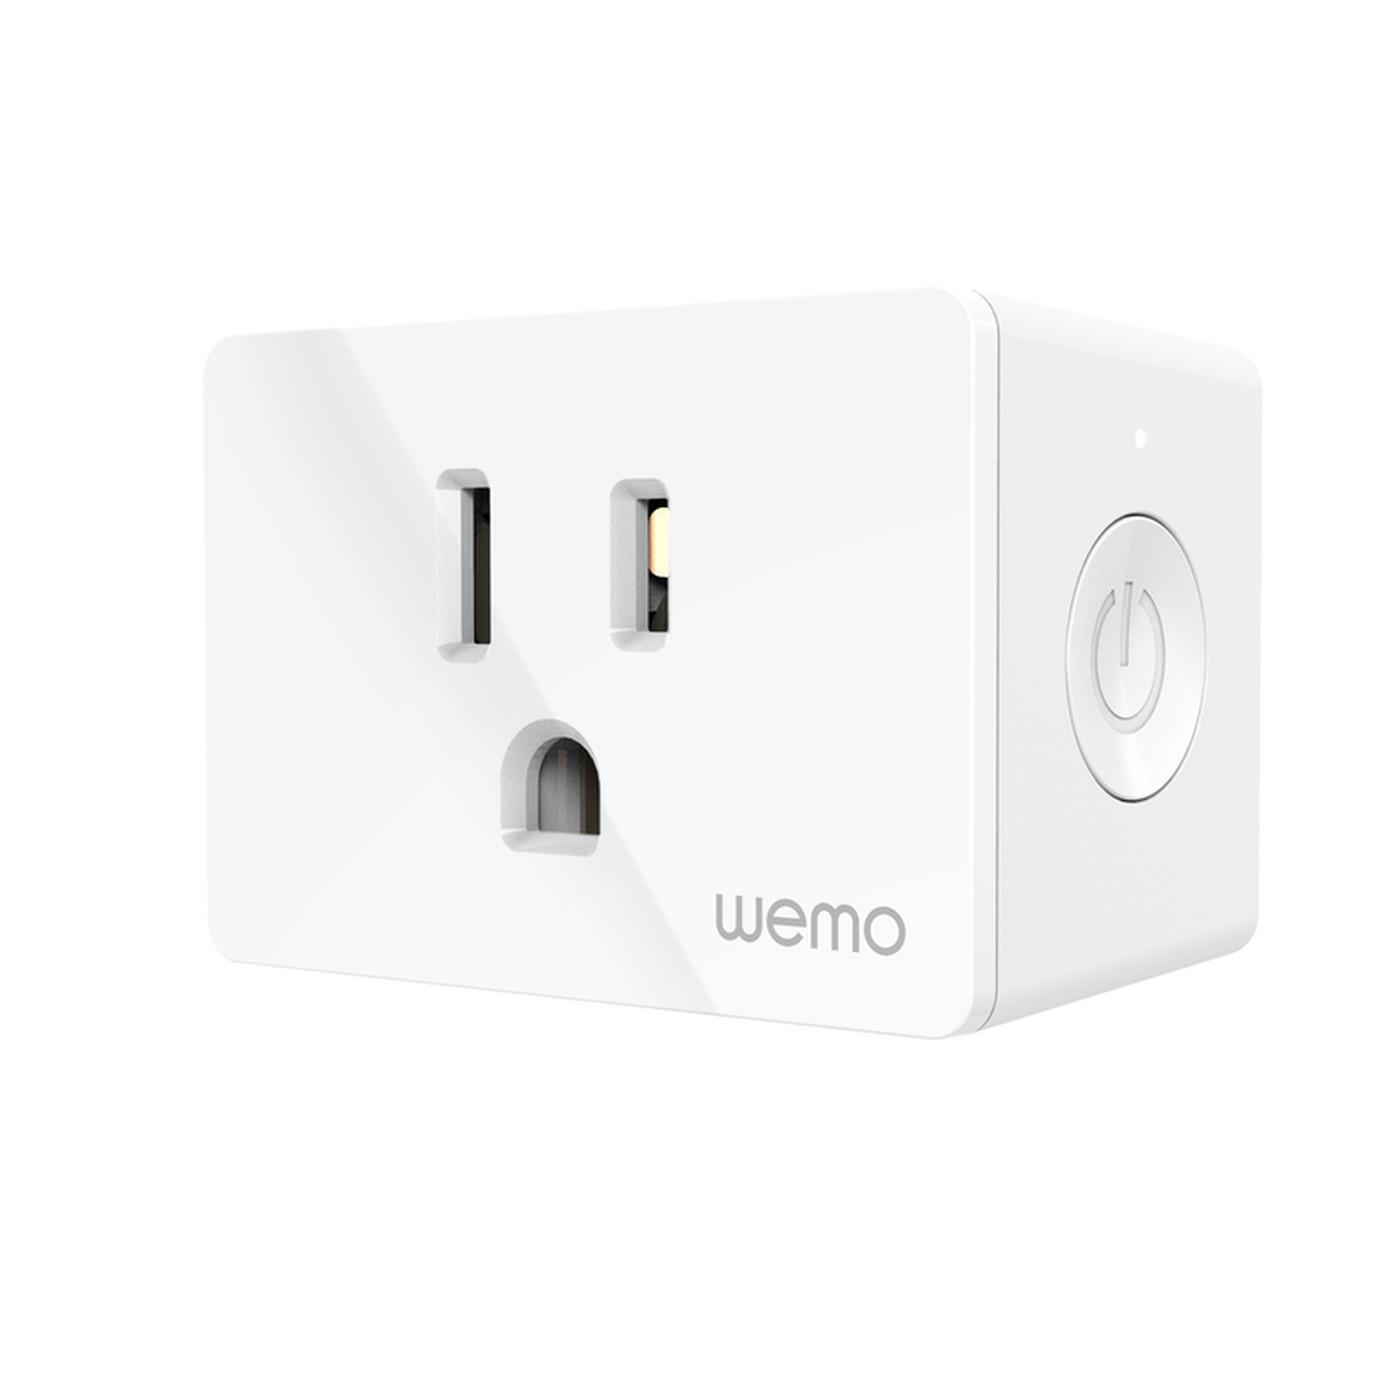 Wemo WiFi Smart Plug Compact